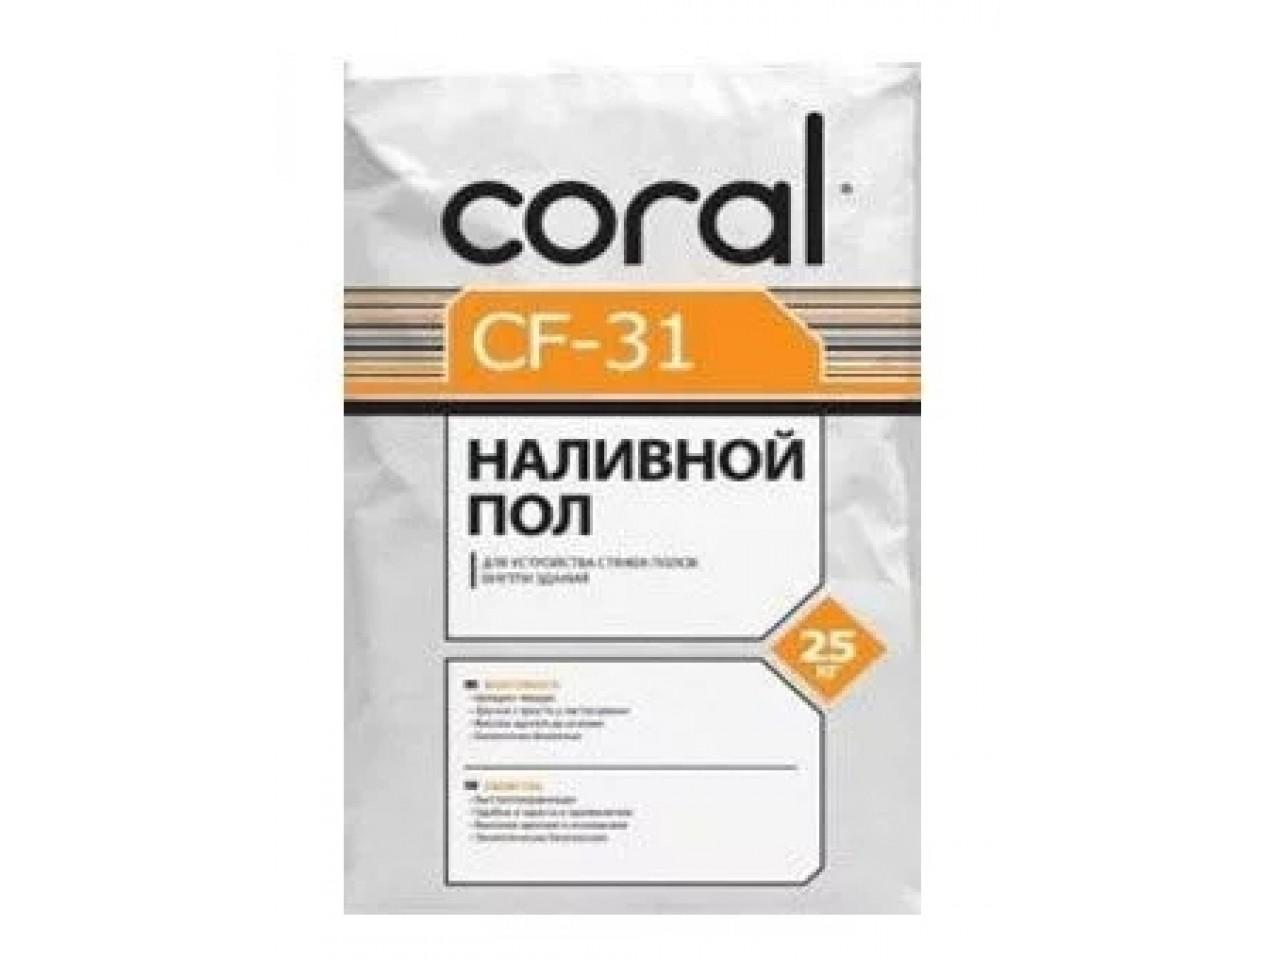 Стяжка для пола Корал ЦФ 31 (Сoral CF 31) 20-80 мм 25 кг